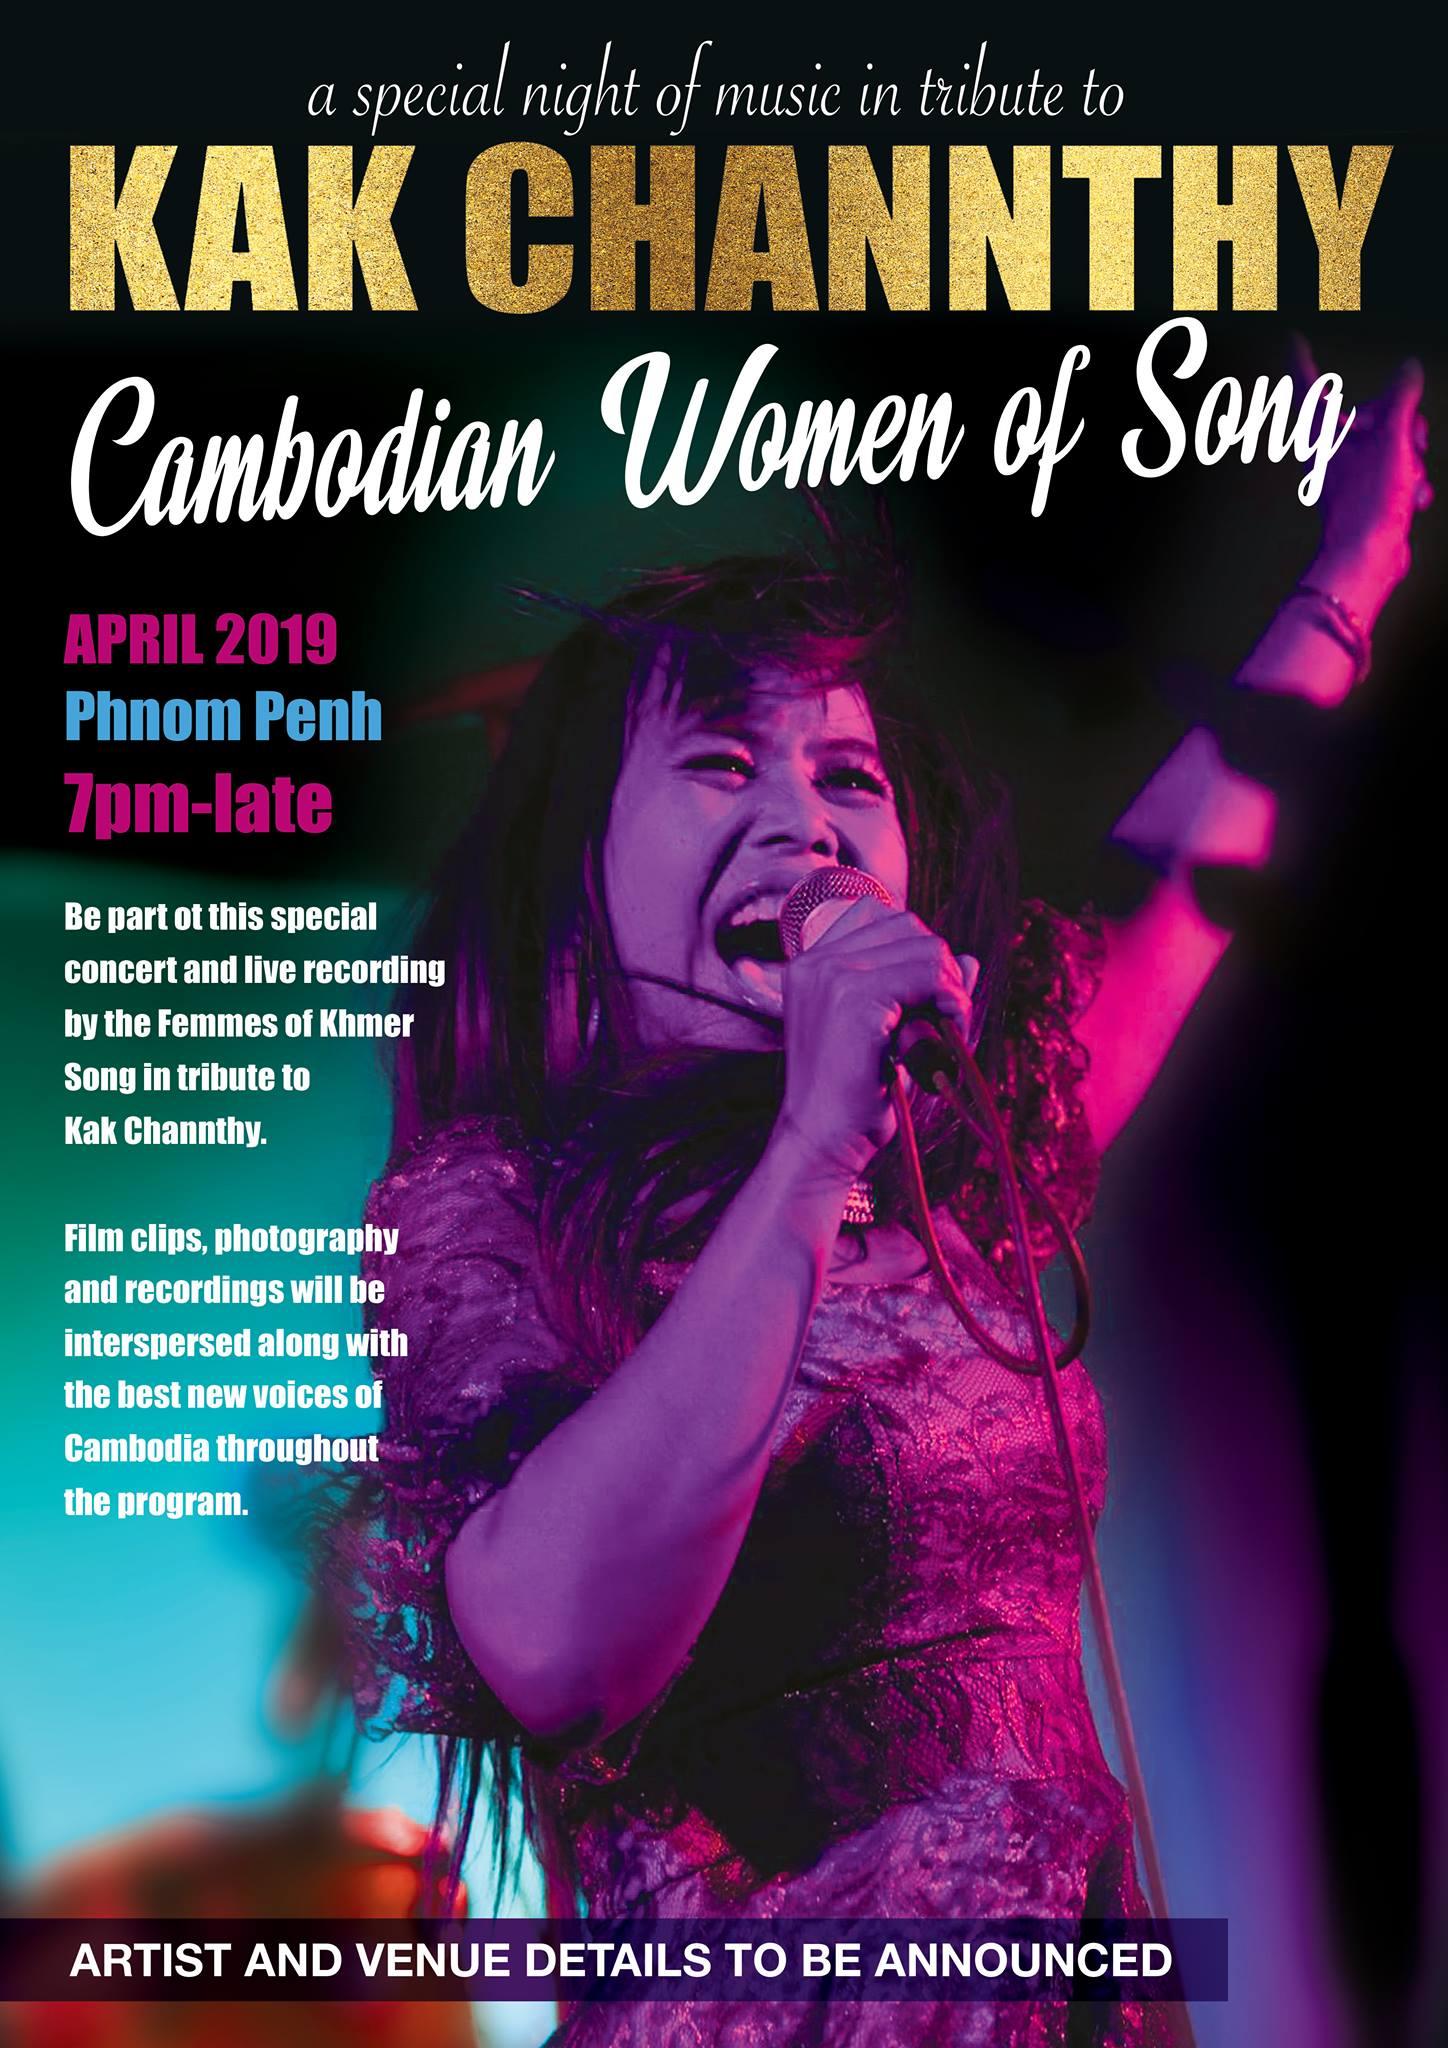 Cambodian Women of Song